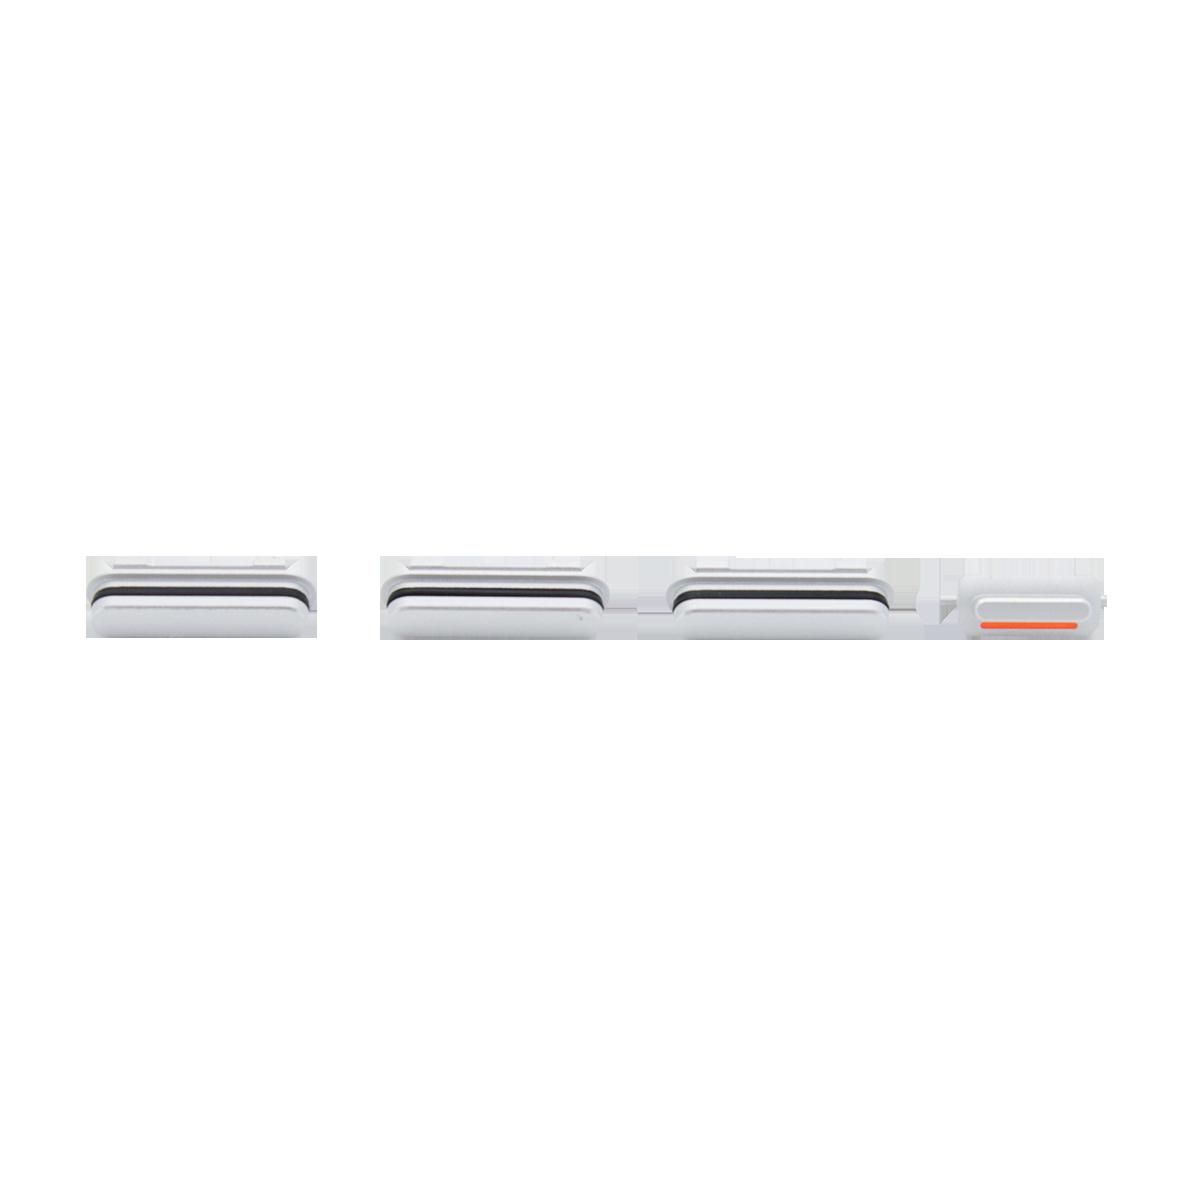 אייפון 6S Plus ערכת ברגים -Rose זהב